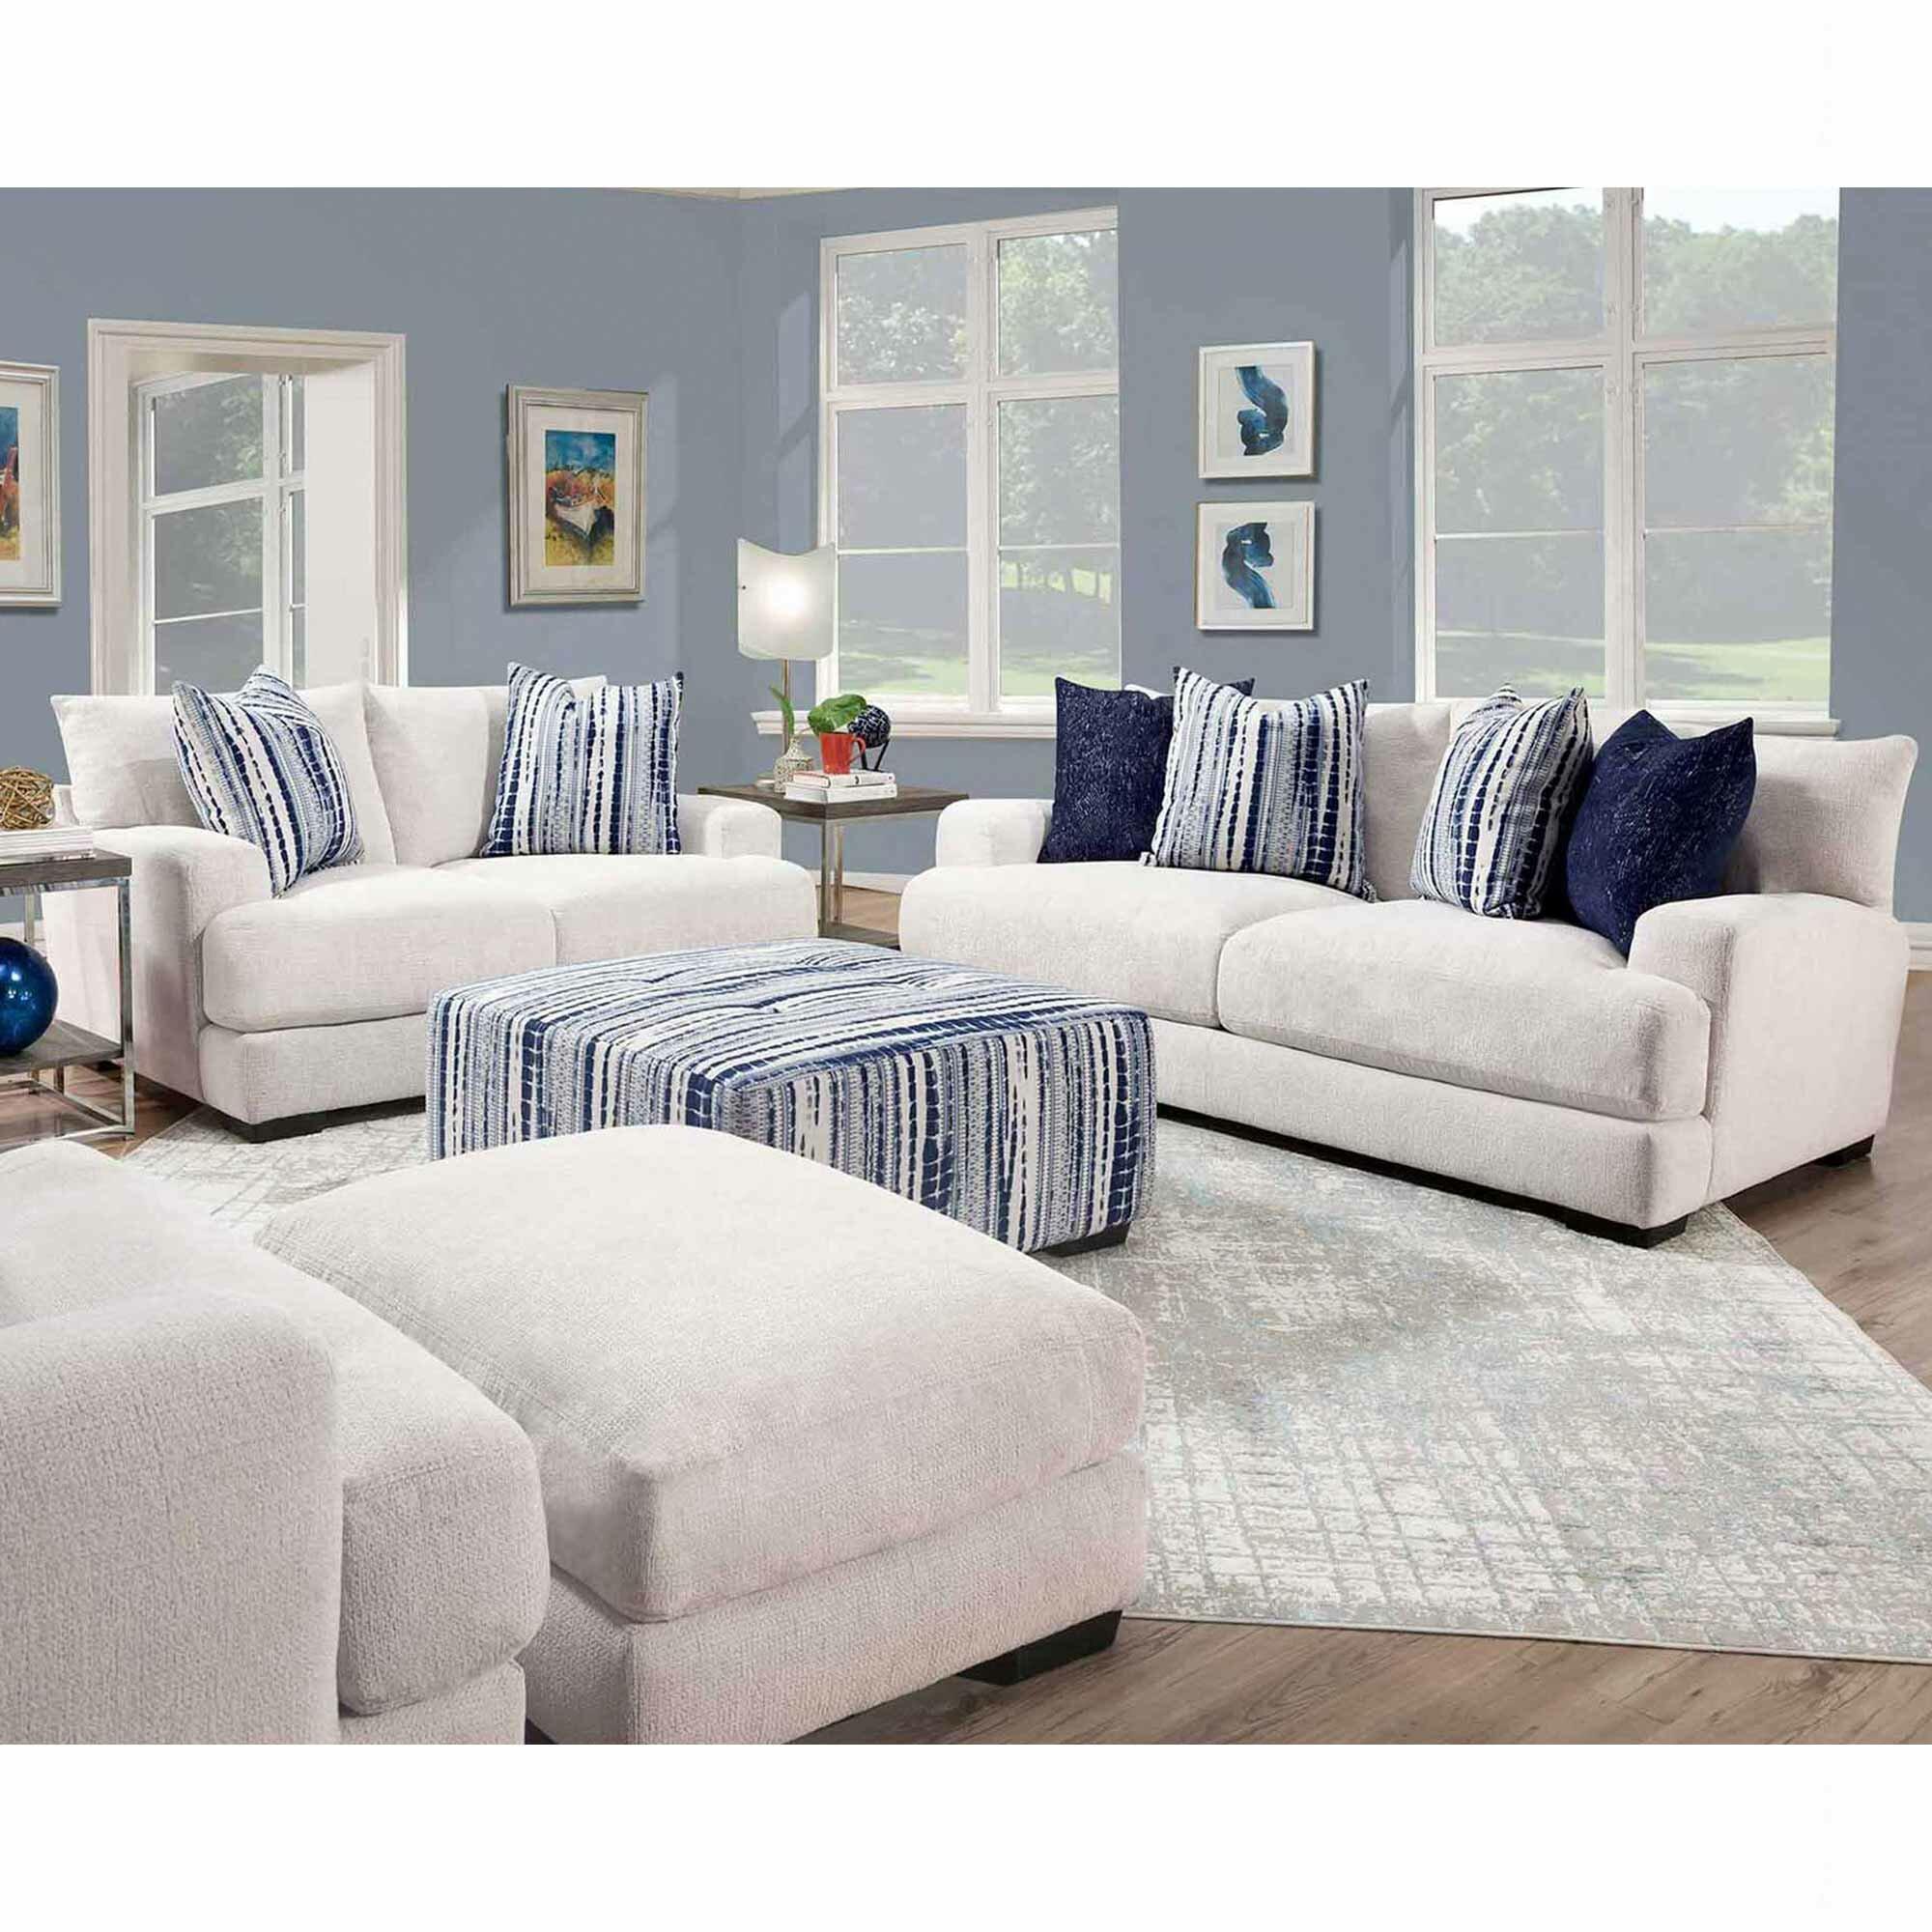 Birch Lane Delozier Configurable Living Room Set Reviews Wayfair Ca